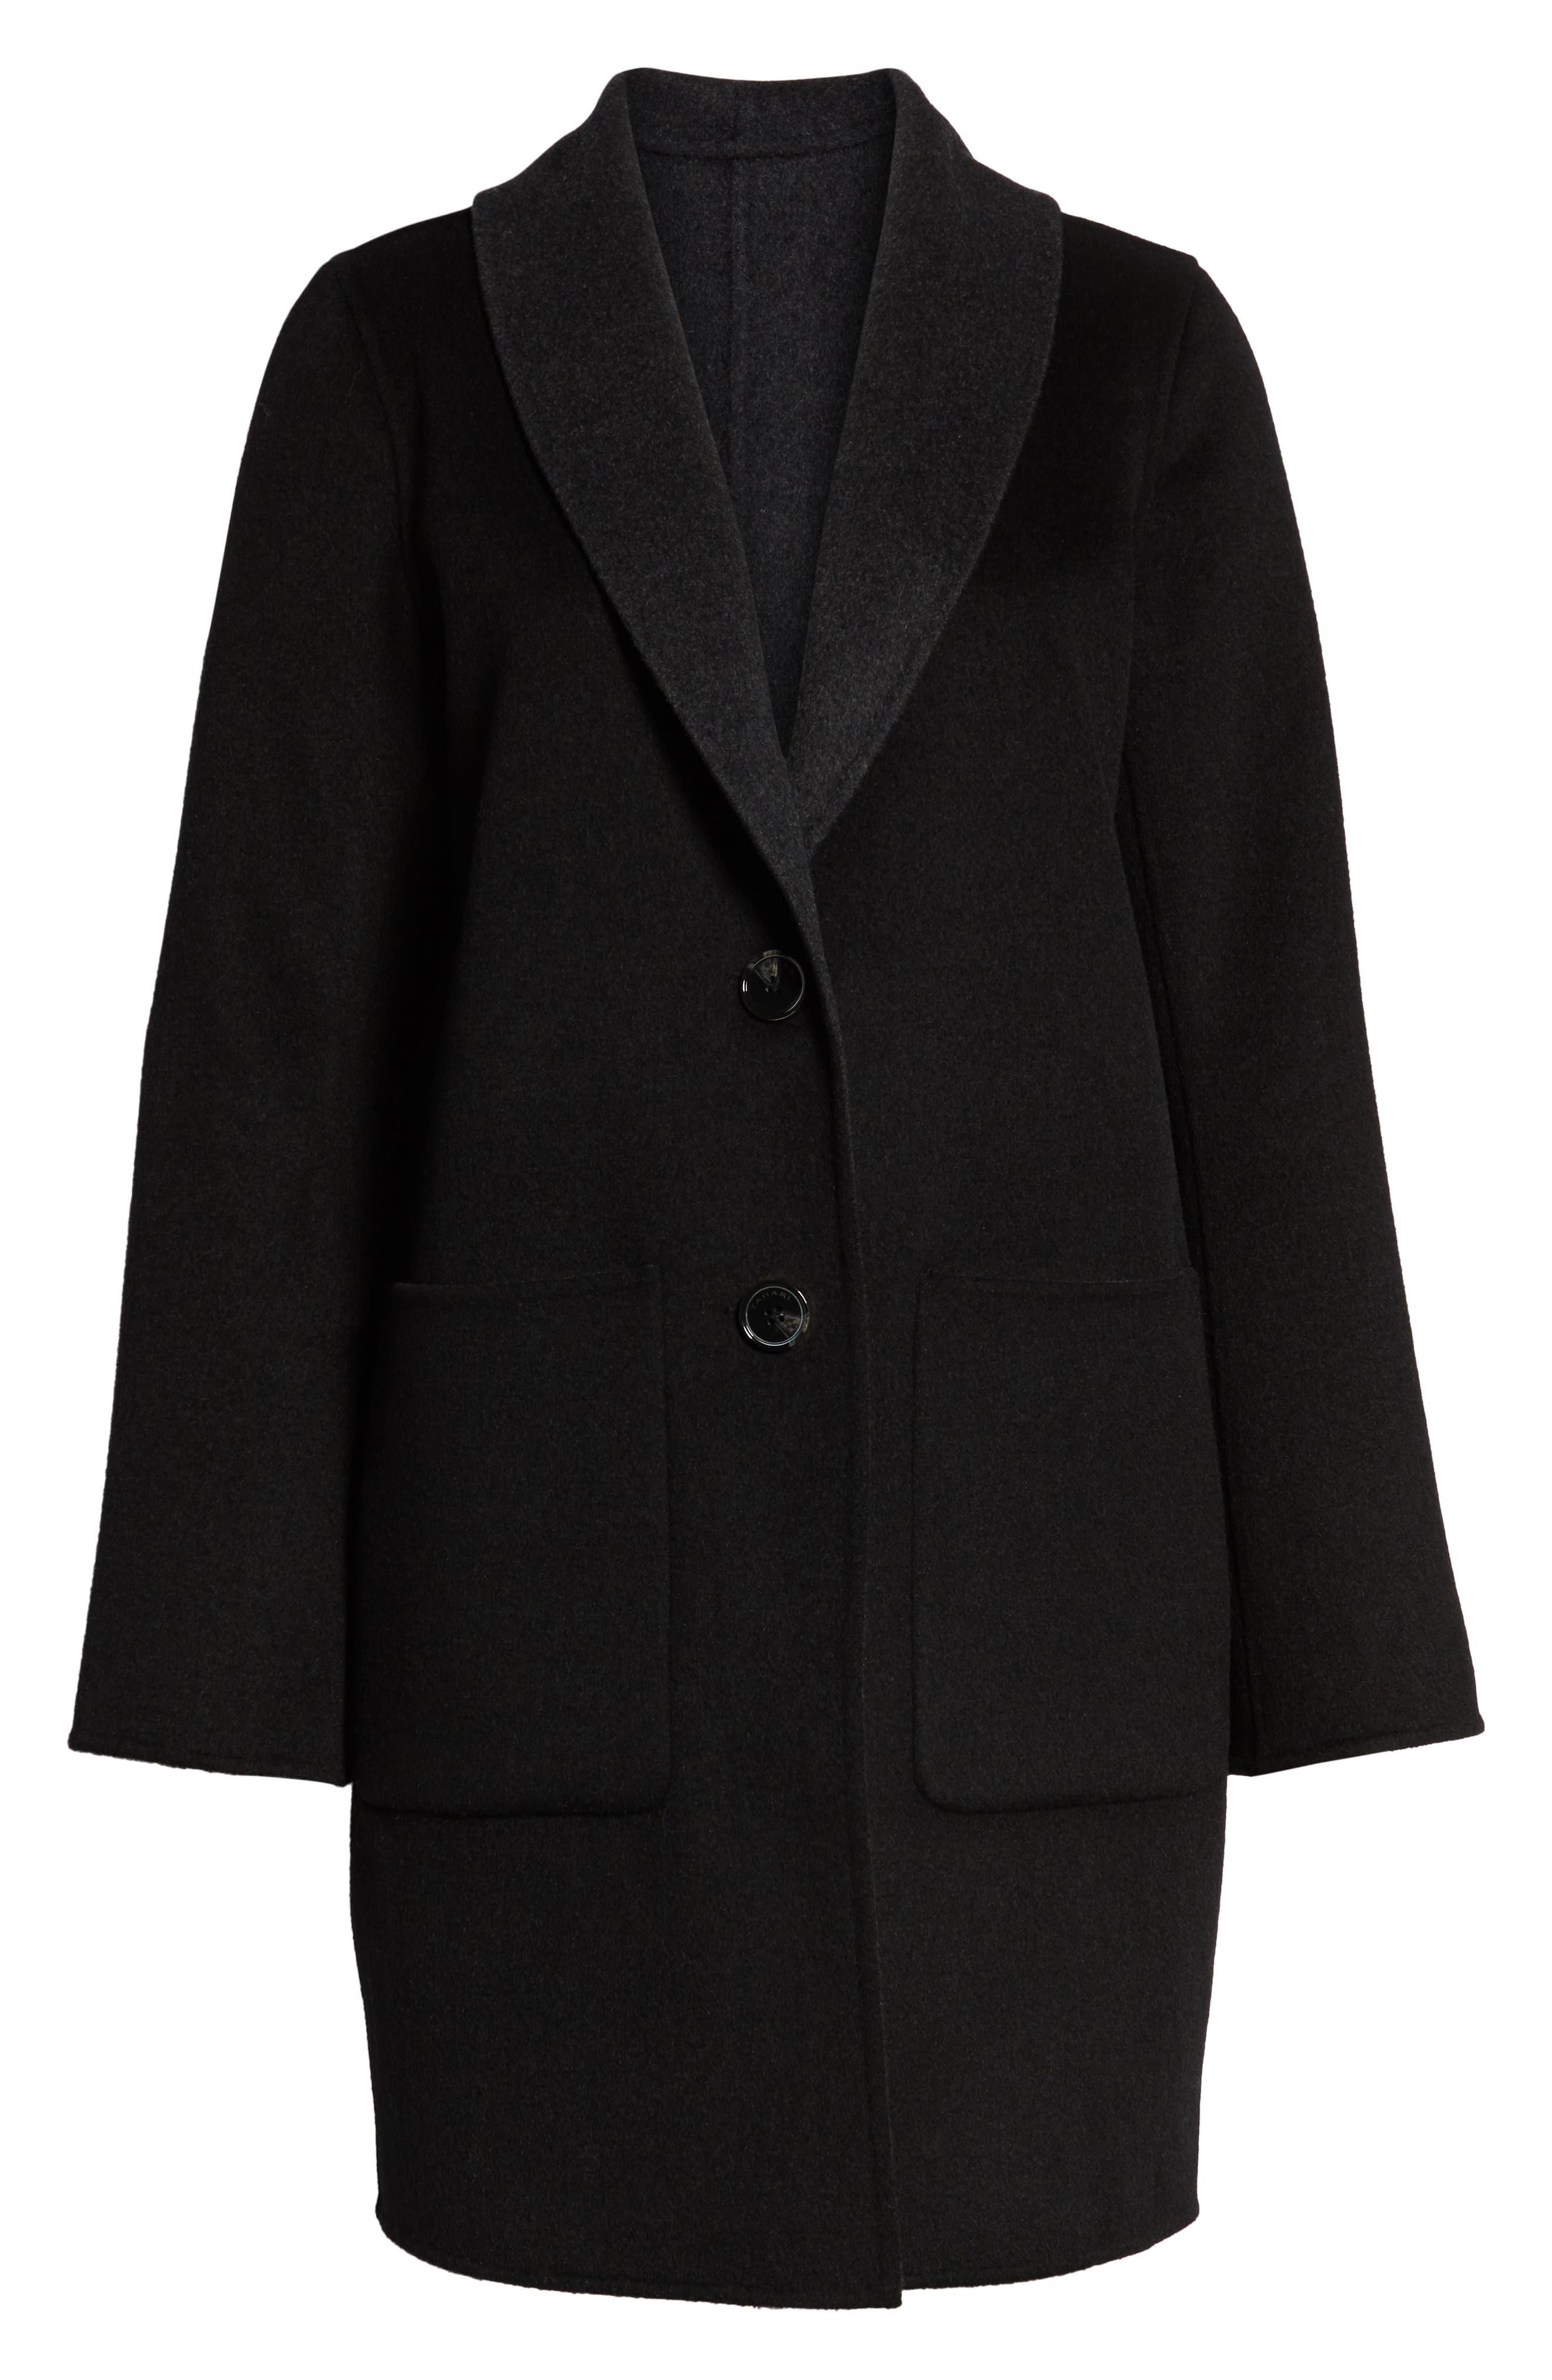 Jenn Double Face Wool Blend Reversible Coat,                             Alternate thumbnail 6, color,                             016